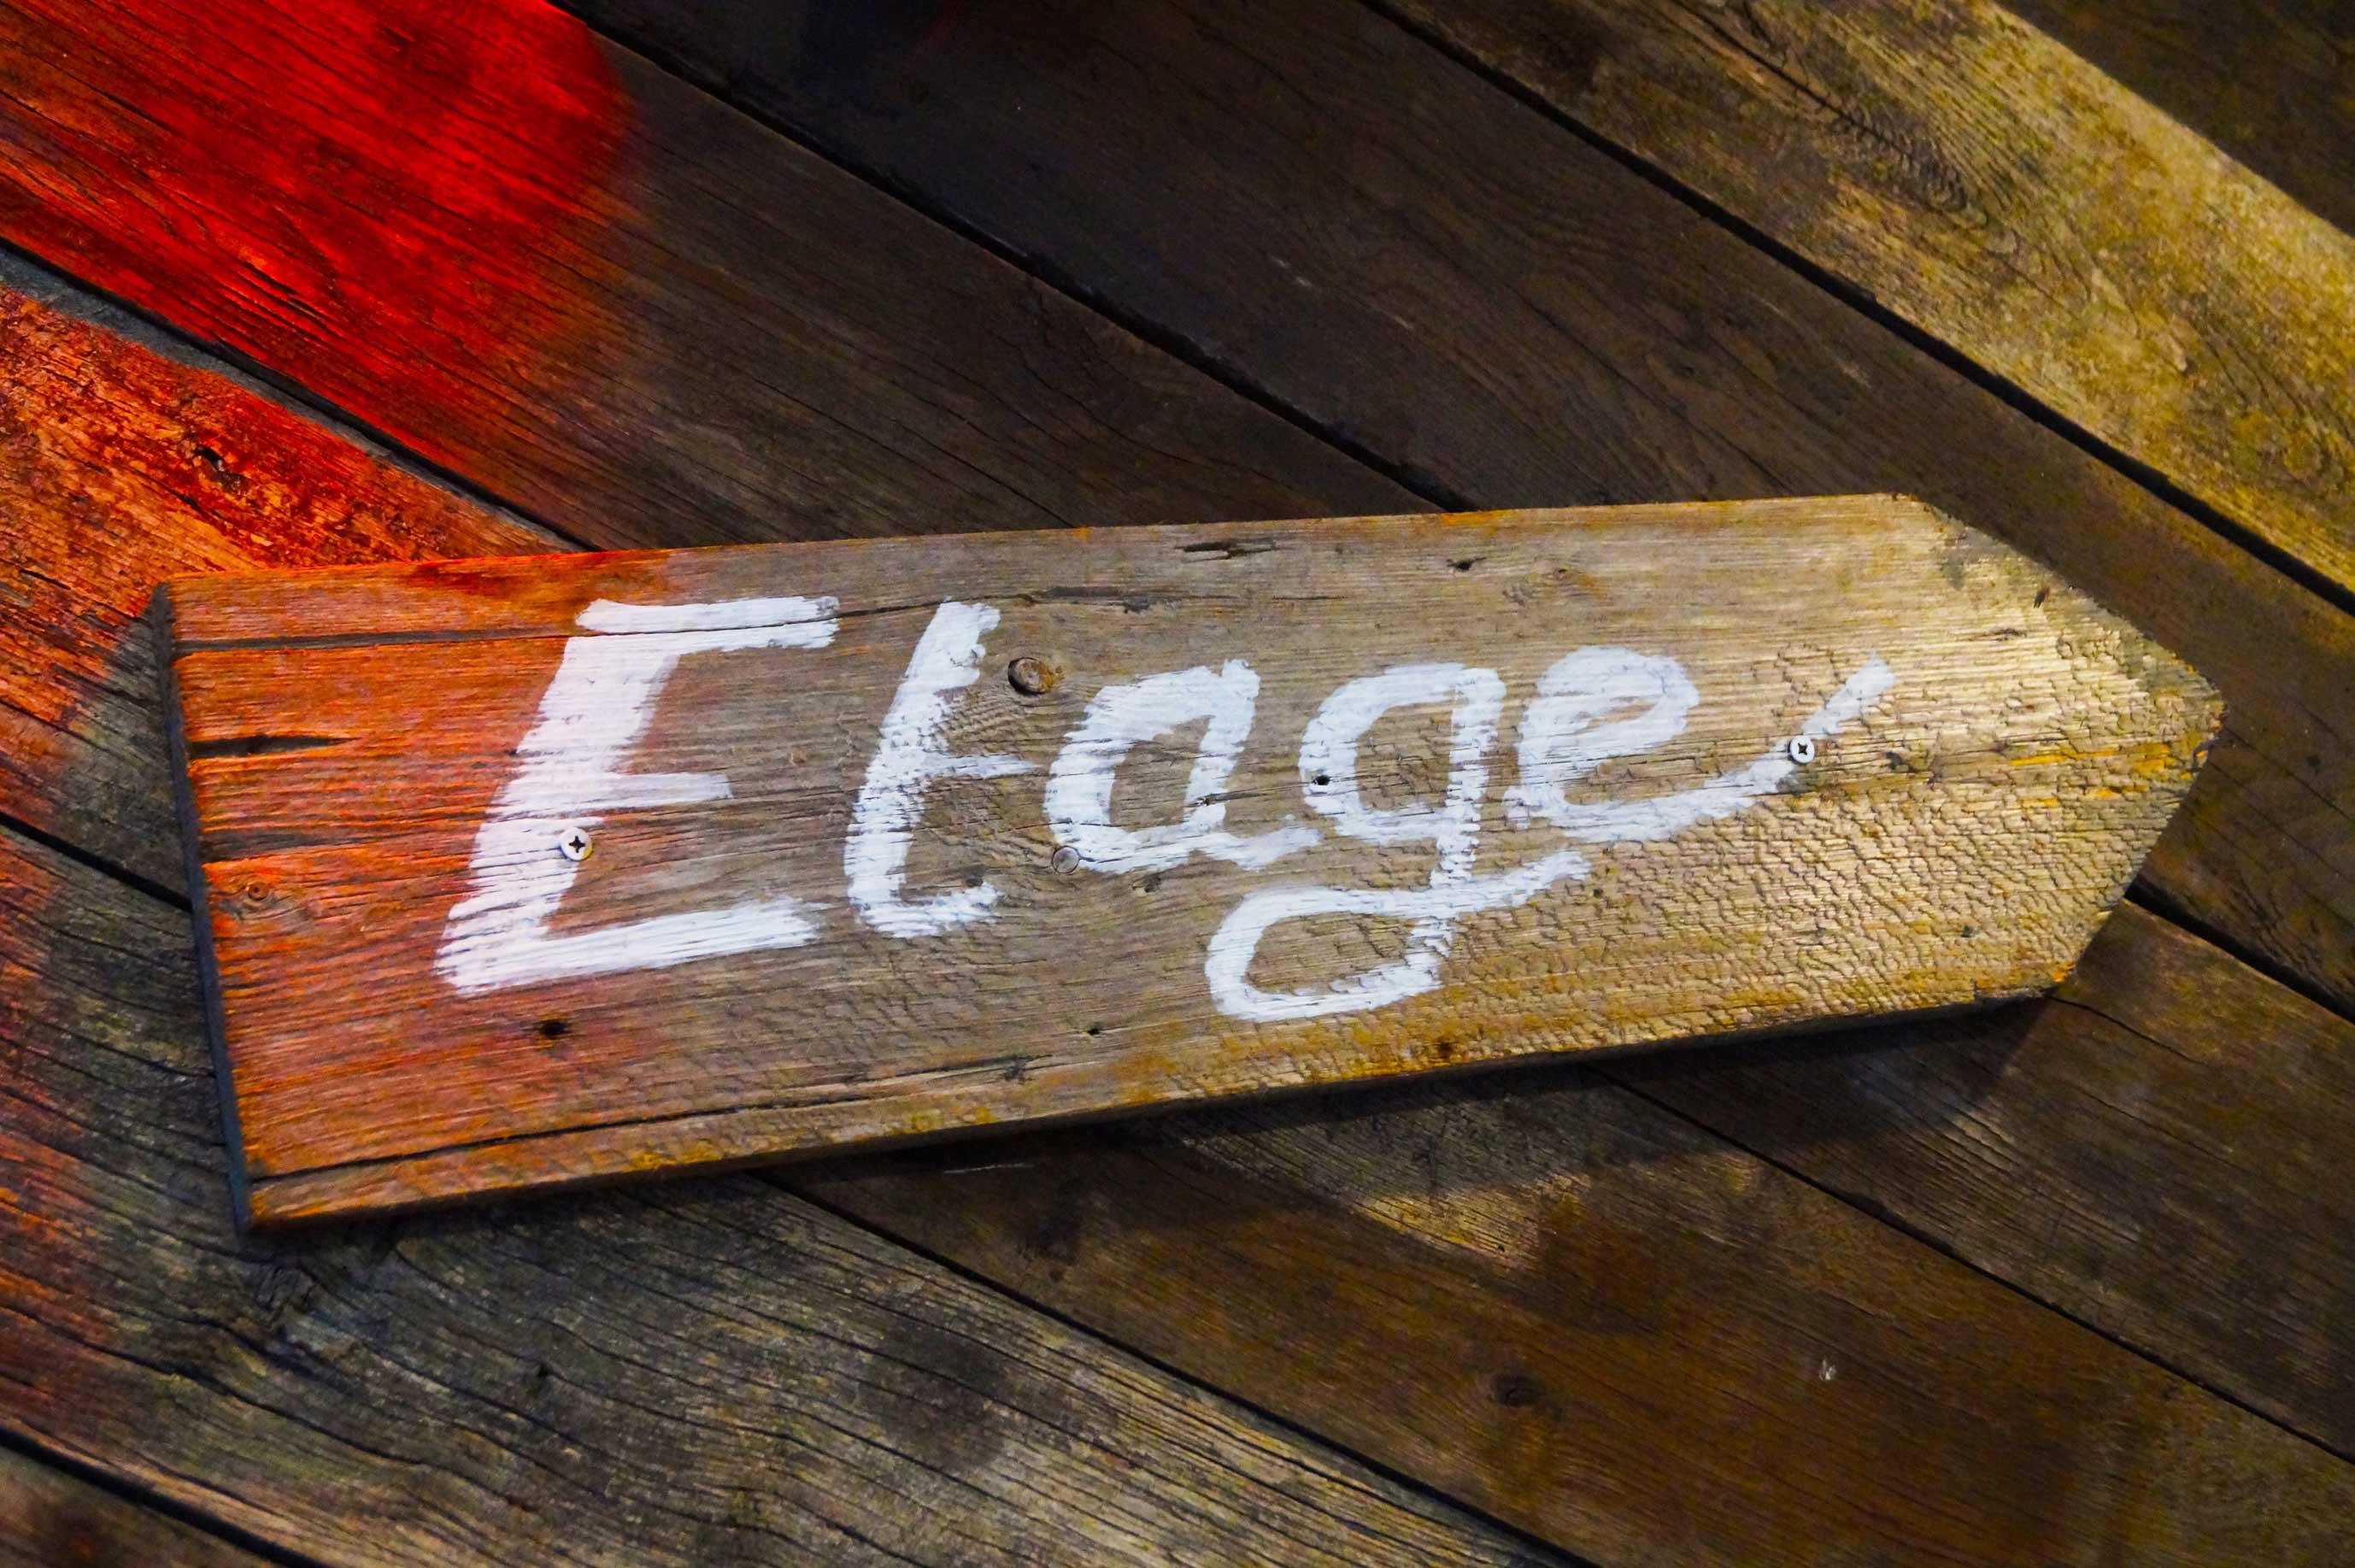 FLECHE-ETAGE